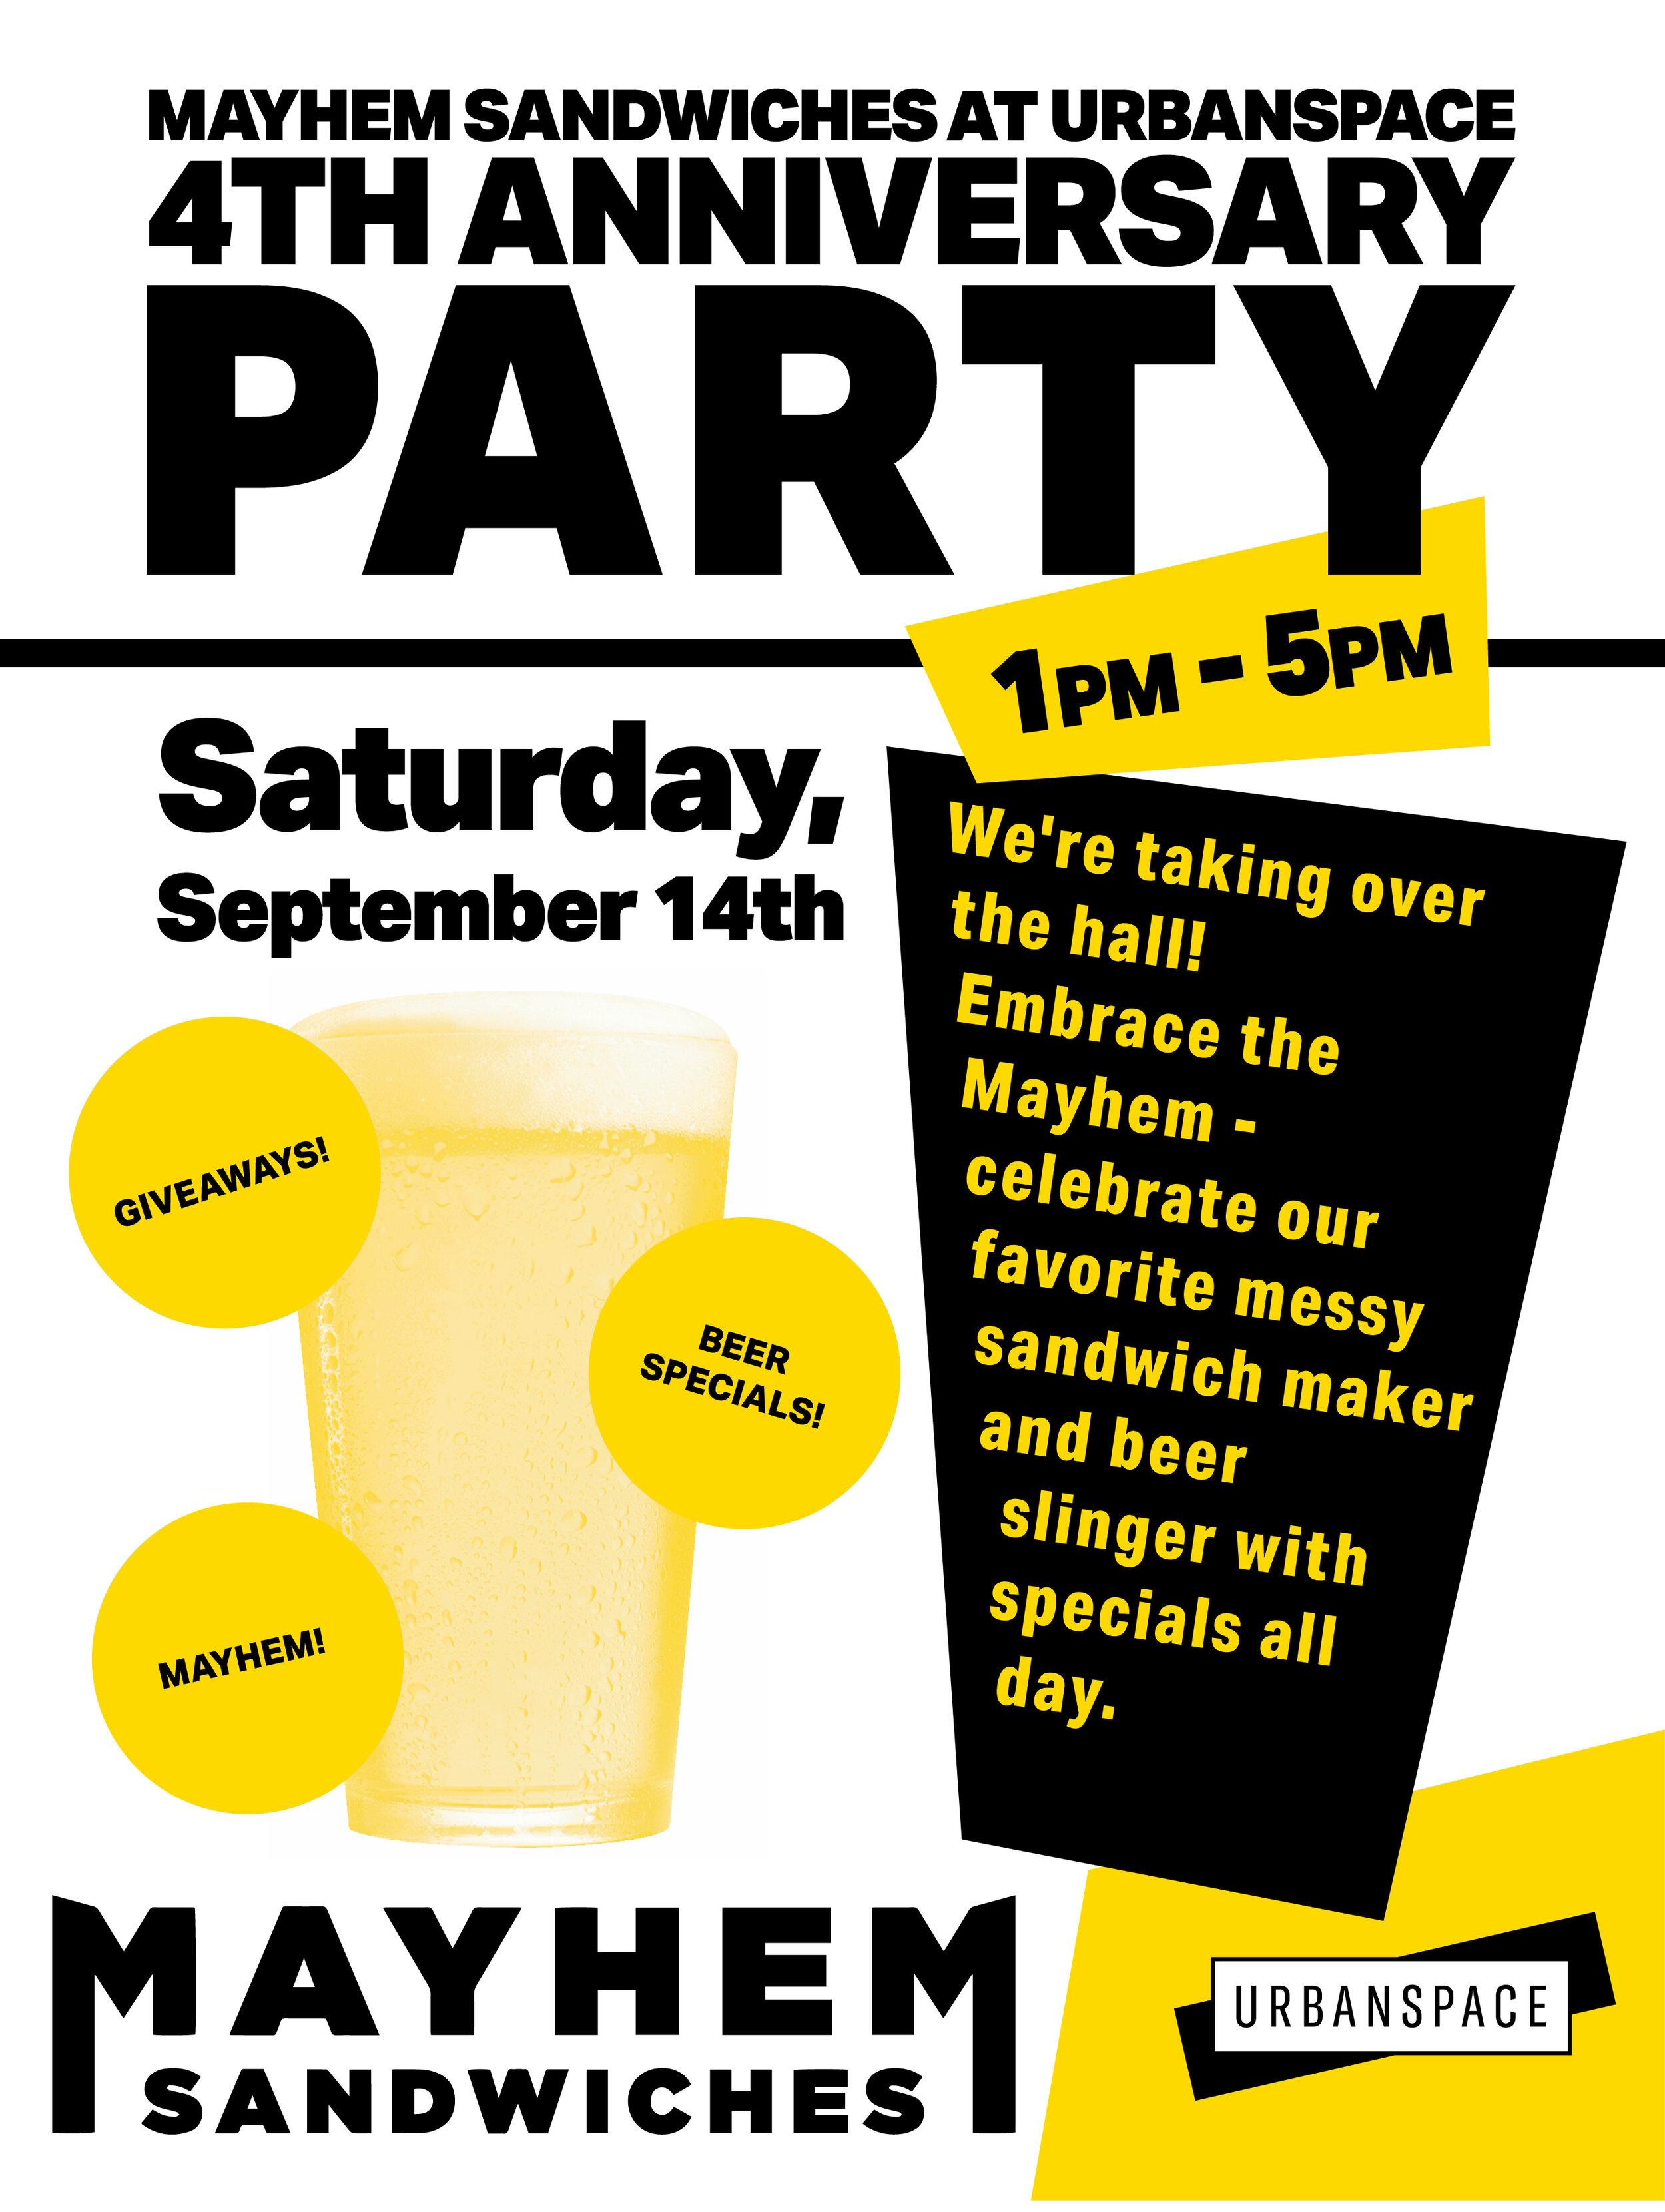 MayhemUS4th_v2_Print Poster 18-x24-.jpg